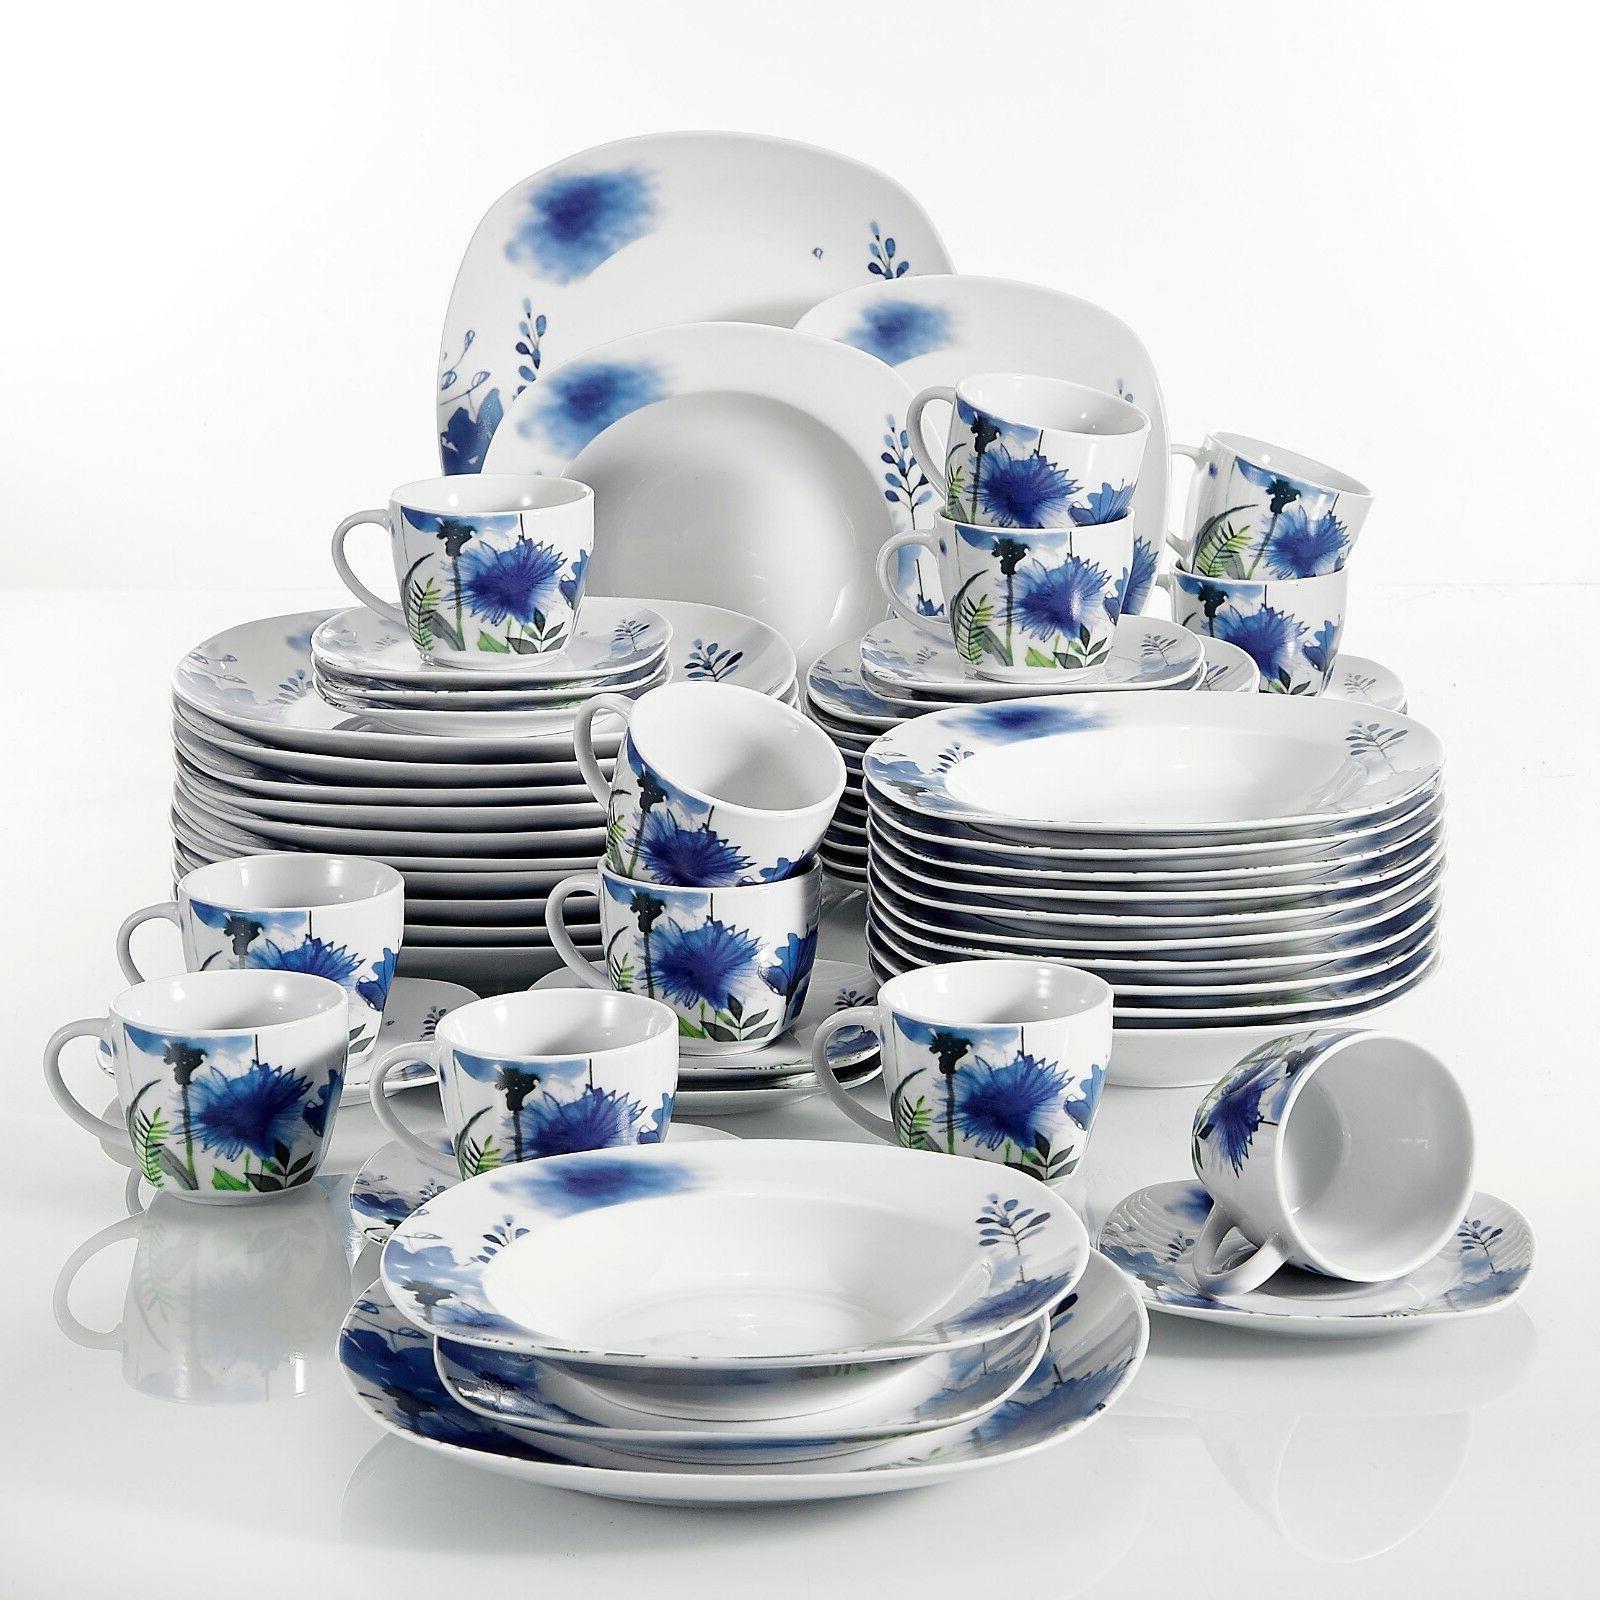 VEWEET Dinnerware Set Royal Flower Set Kitchen Sets